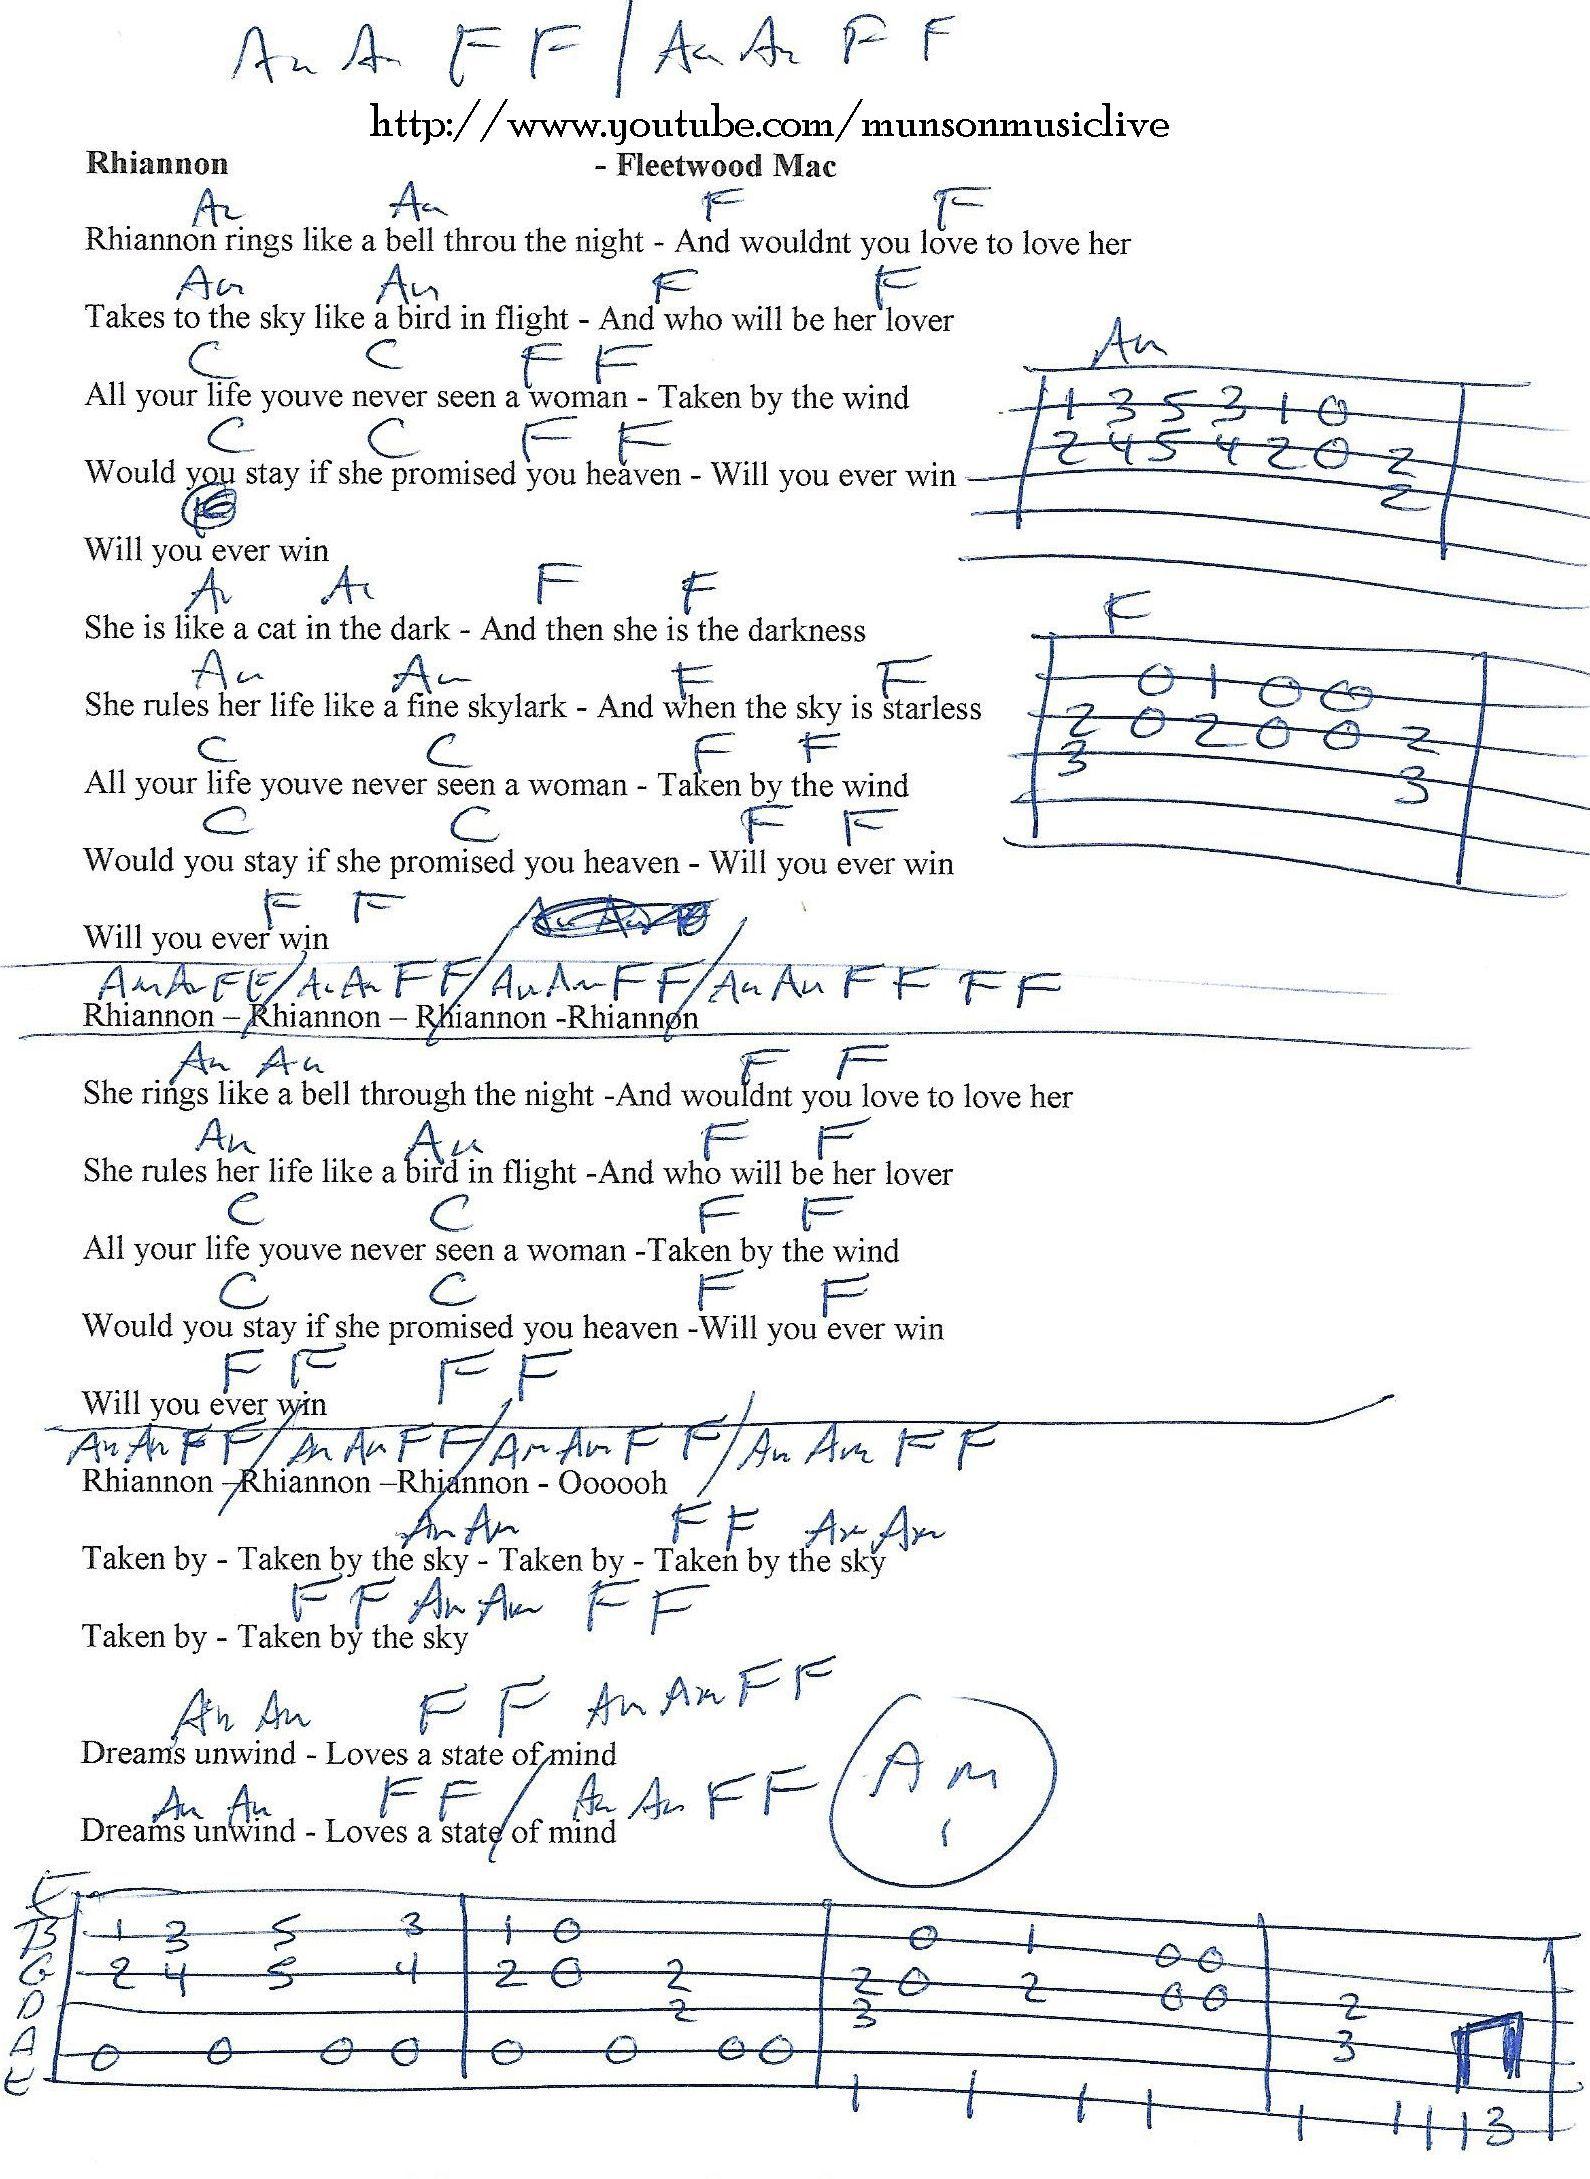 Rhiannon Fleetwood Mac Guitar Chord Chart Tabs Especiales